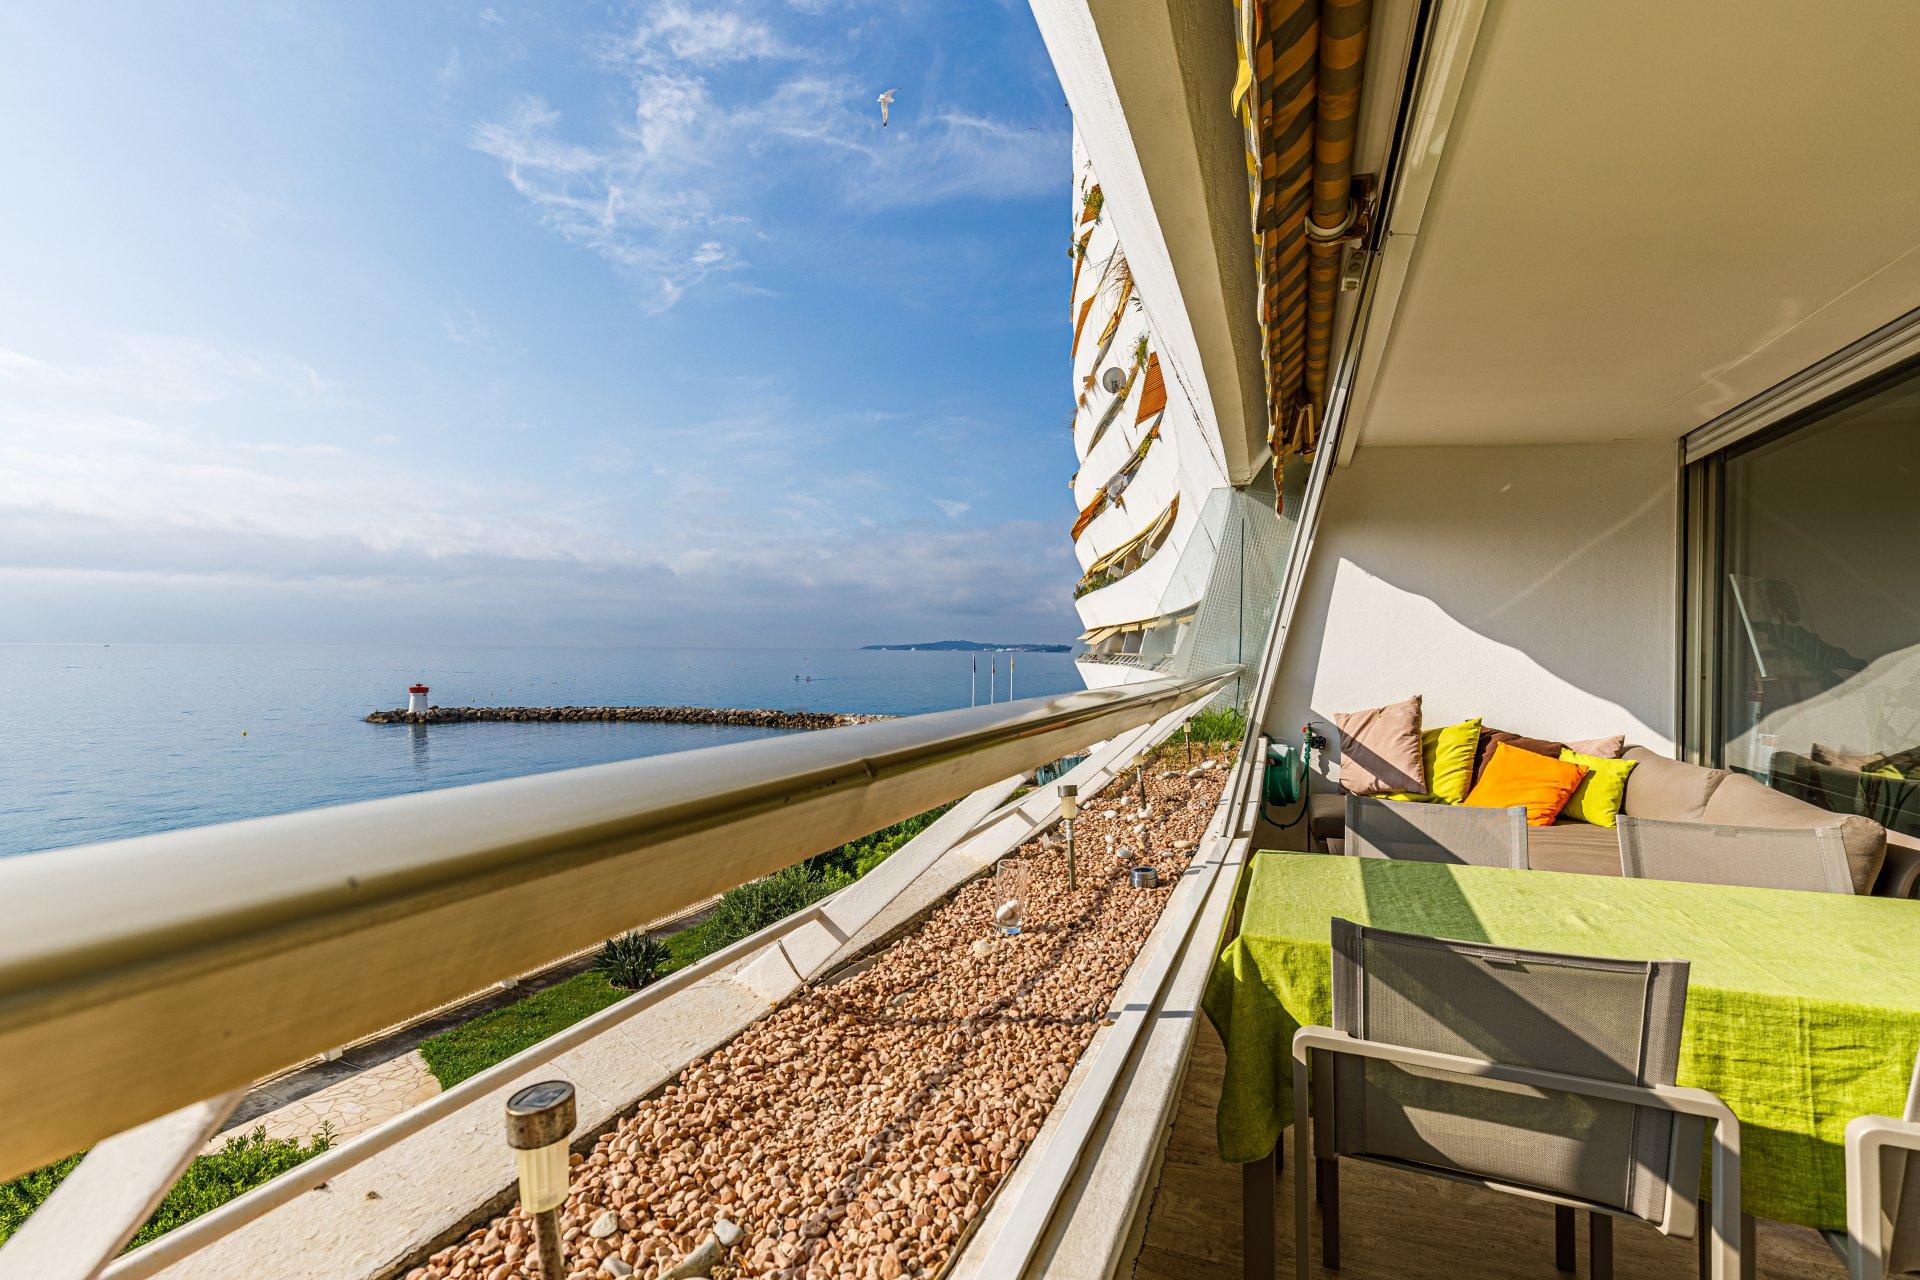 Waterfront 2-bed, terrace, sea view, Marina Baie des Anges in Villeneuve-Loubet